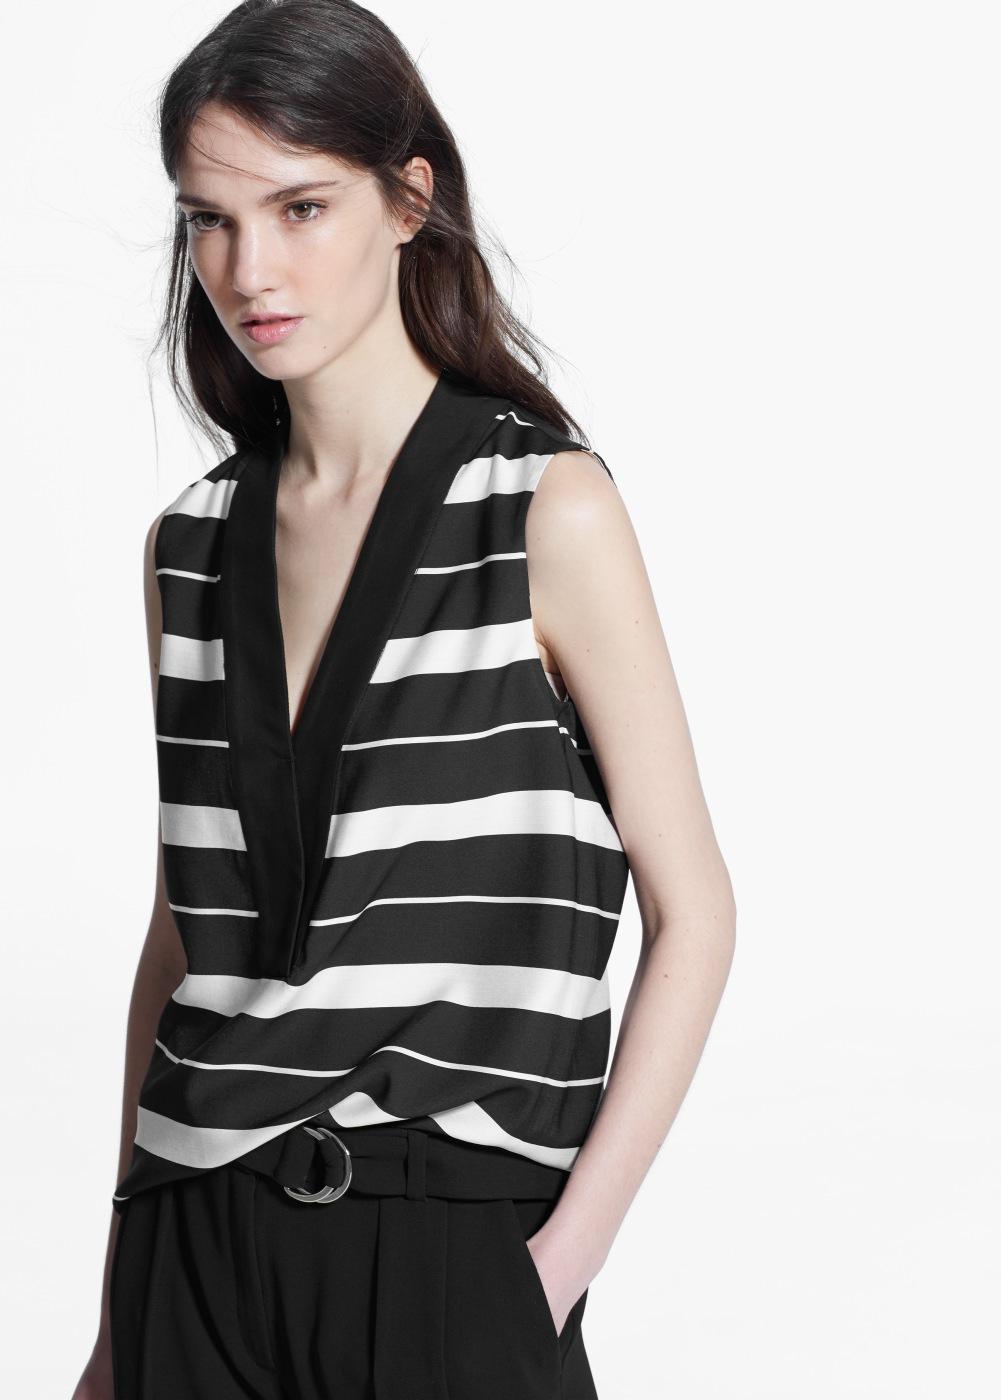 Flowy Striped Blouse , $39.99